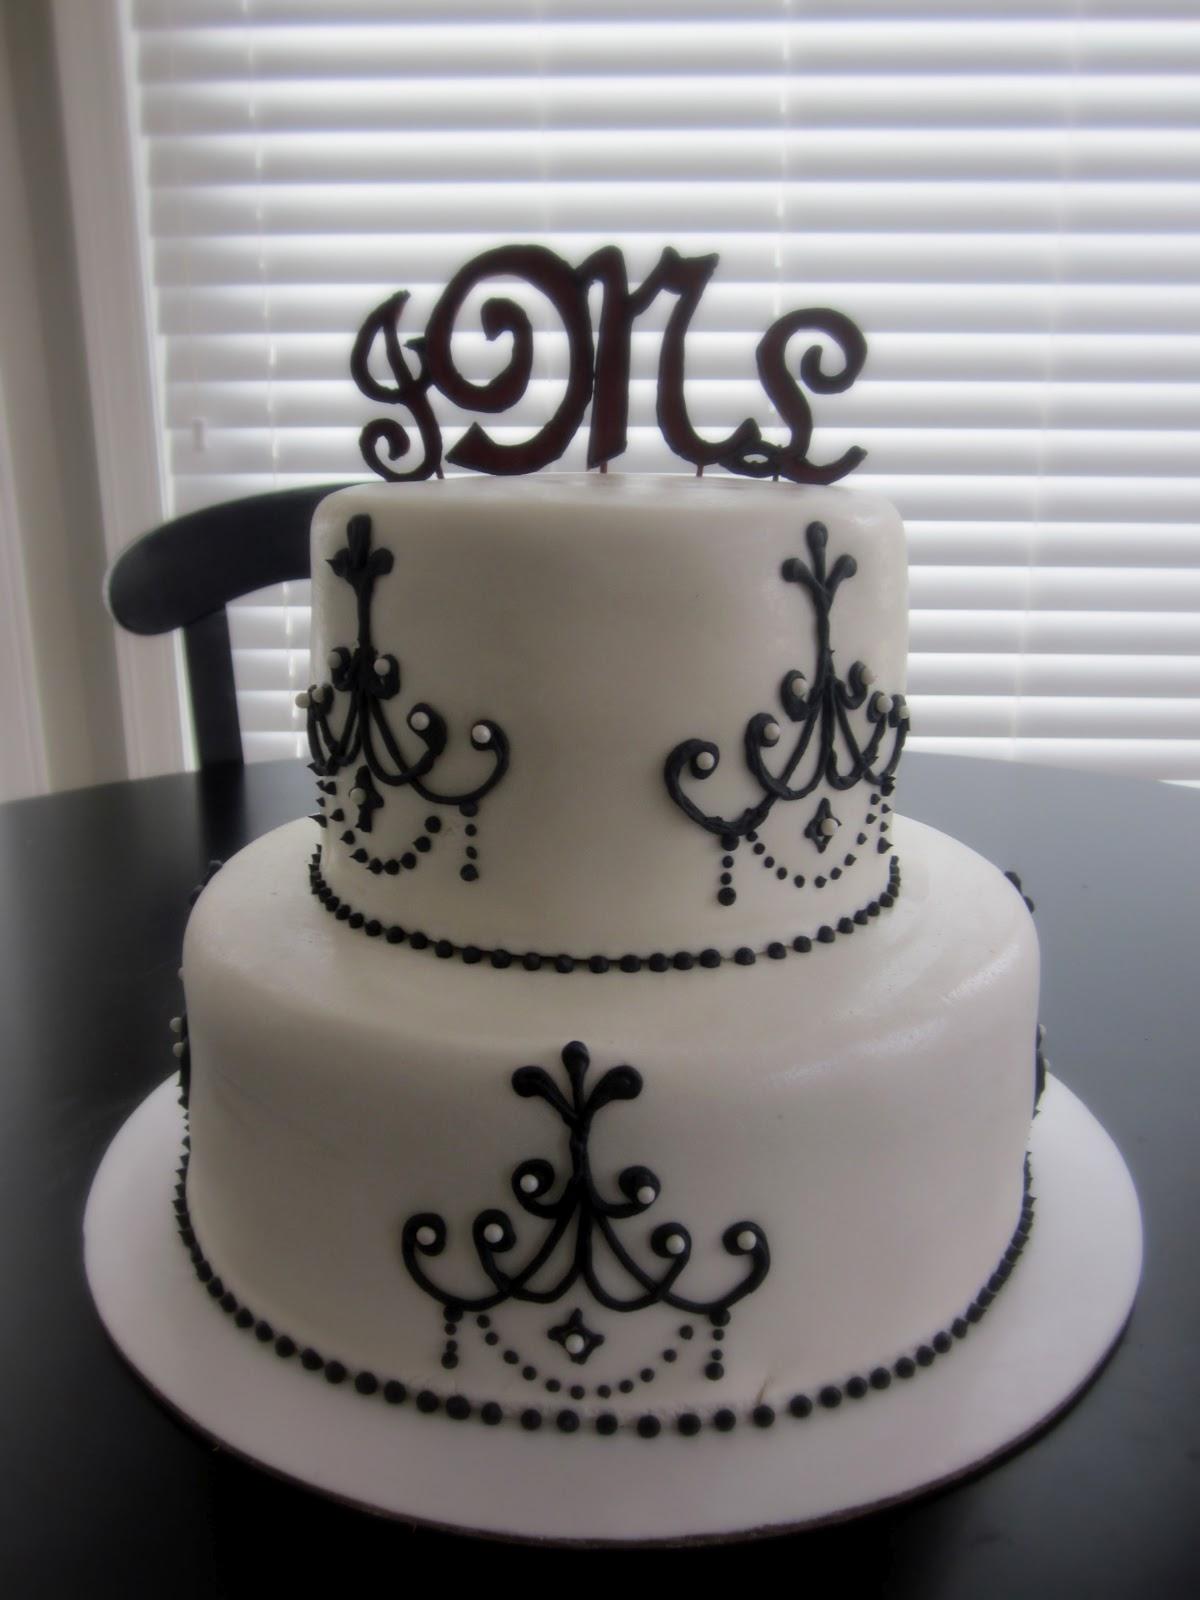 Angus Barn Birthday Cake